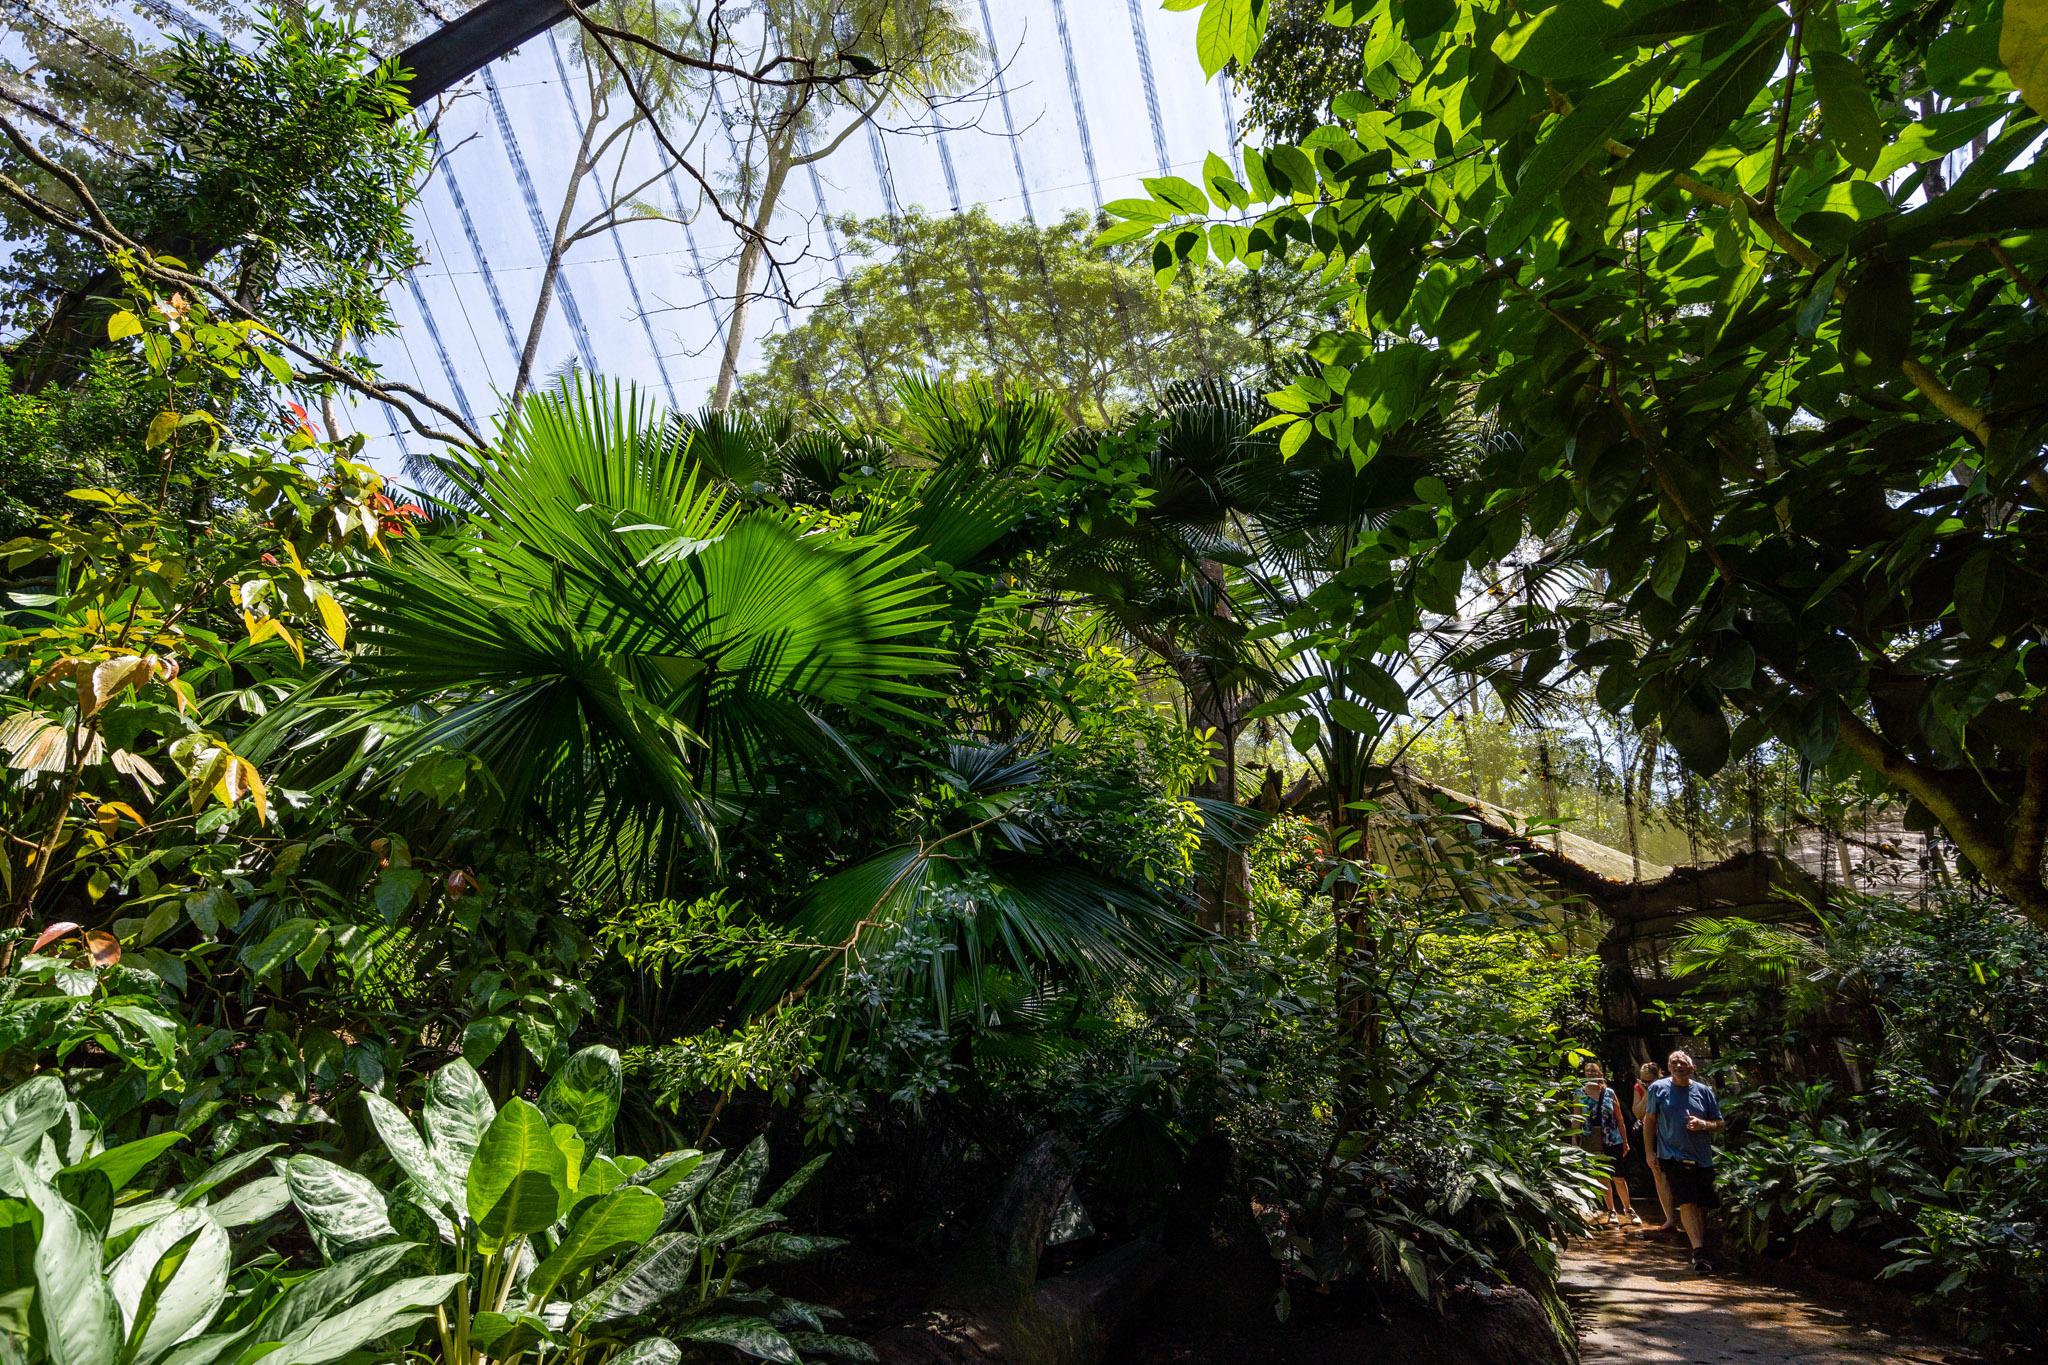 viator-singapore-photographer-tourism-tours-zoo-little-india-gardens-marina-bay-010.jpg